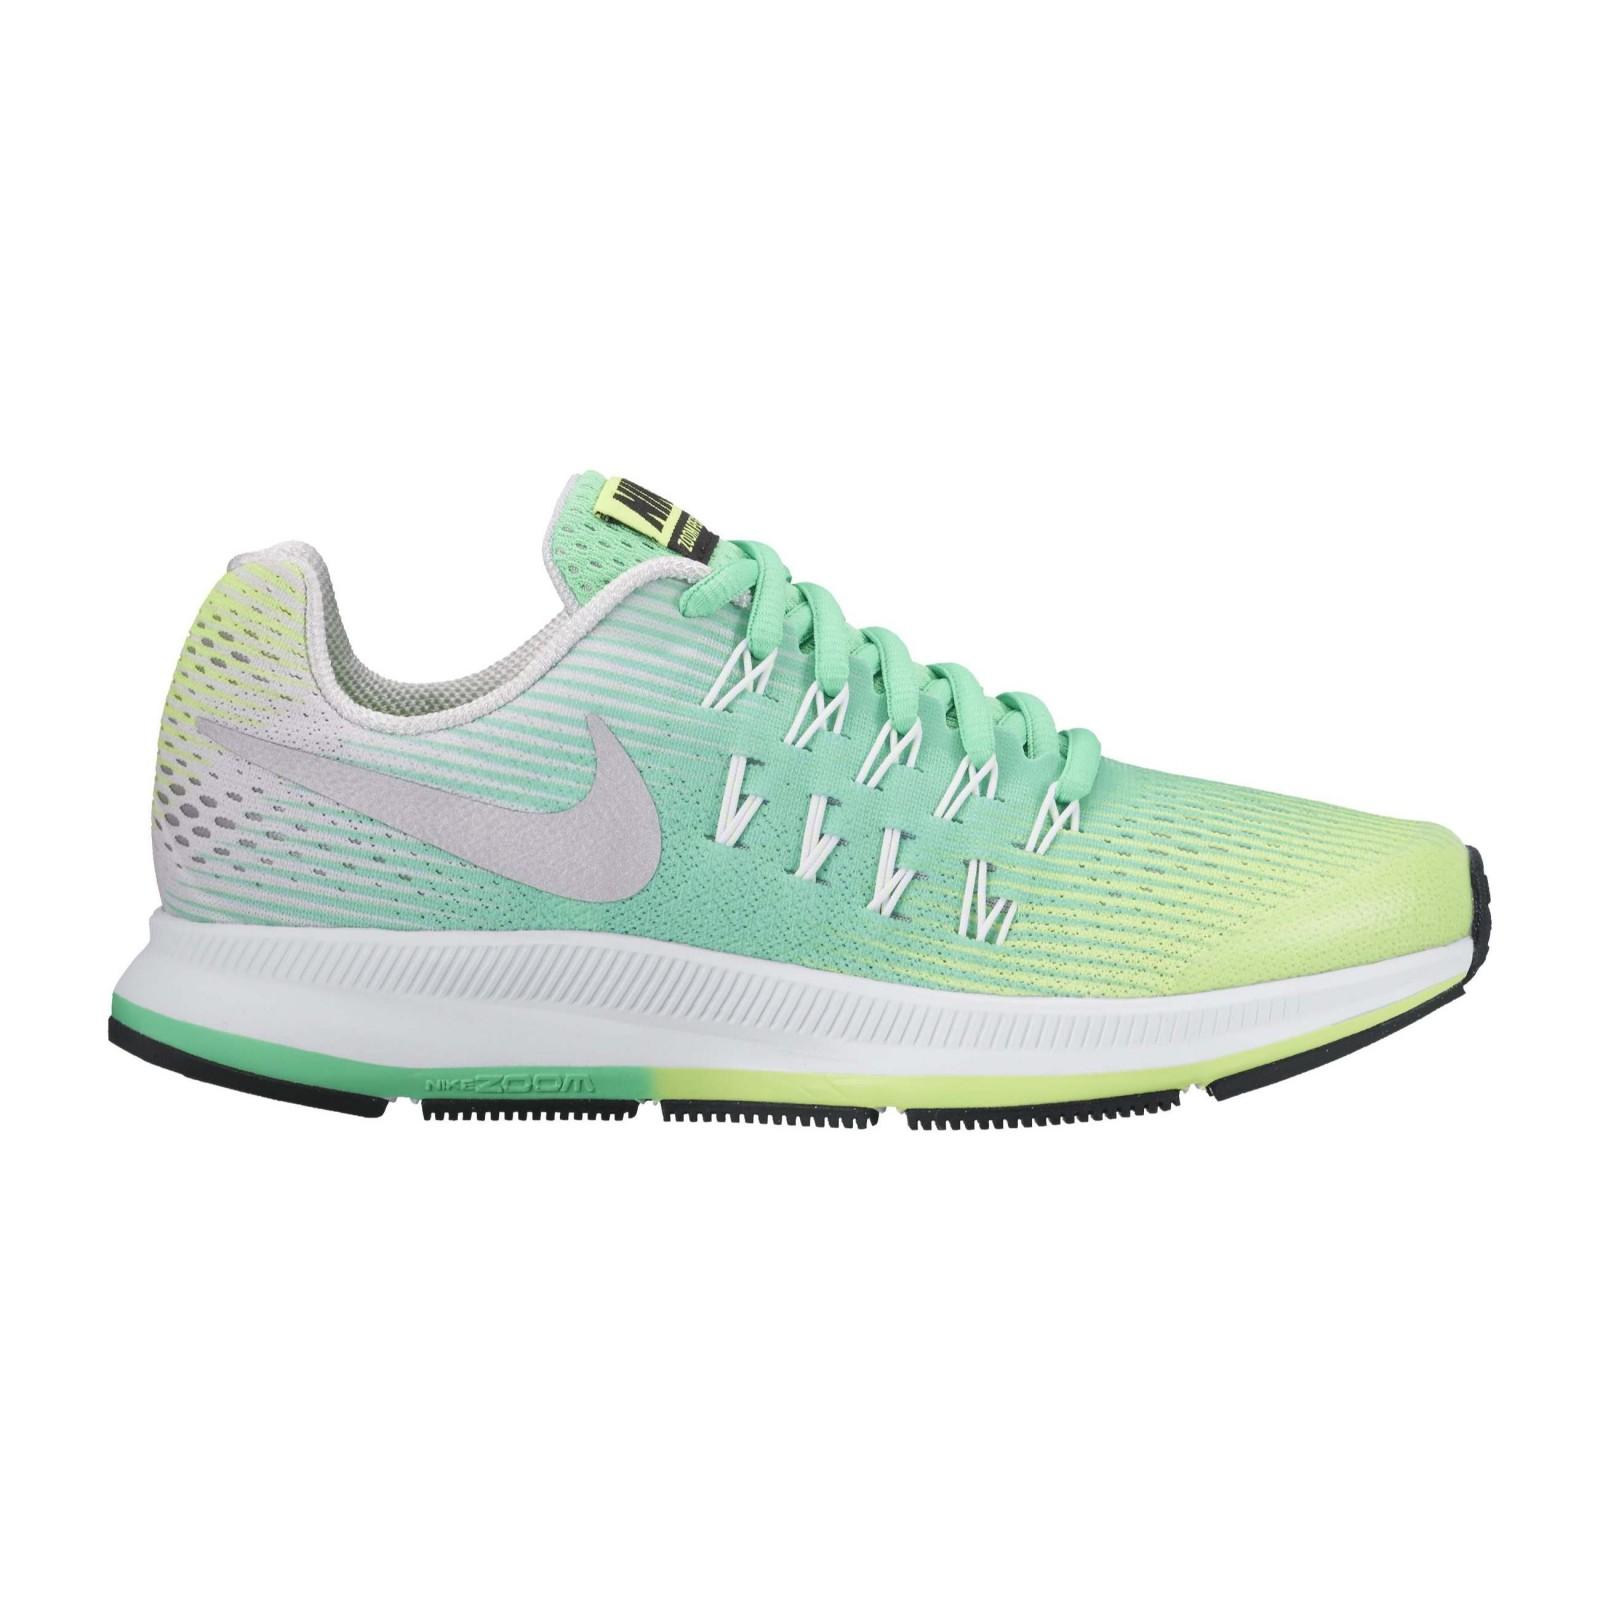 Dětské běžecké boty Nike ZOOM PEGASUS 33 (GS)  9dfac48824